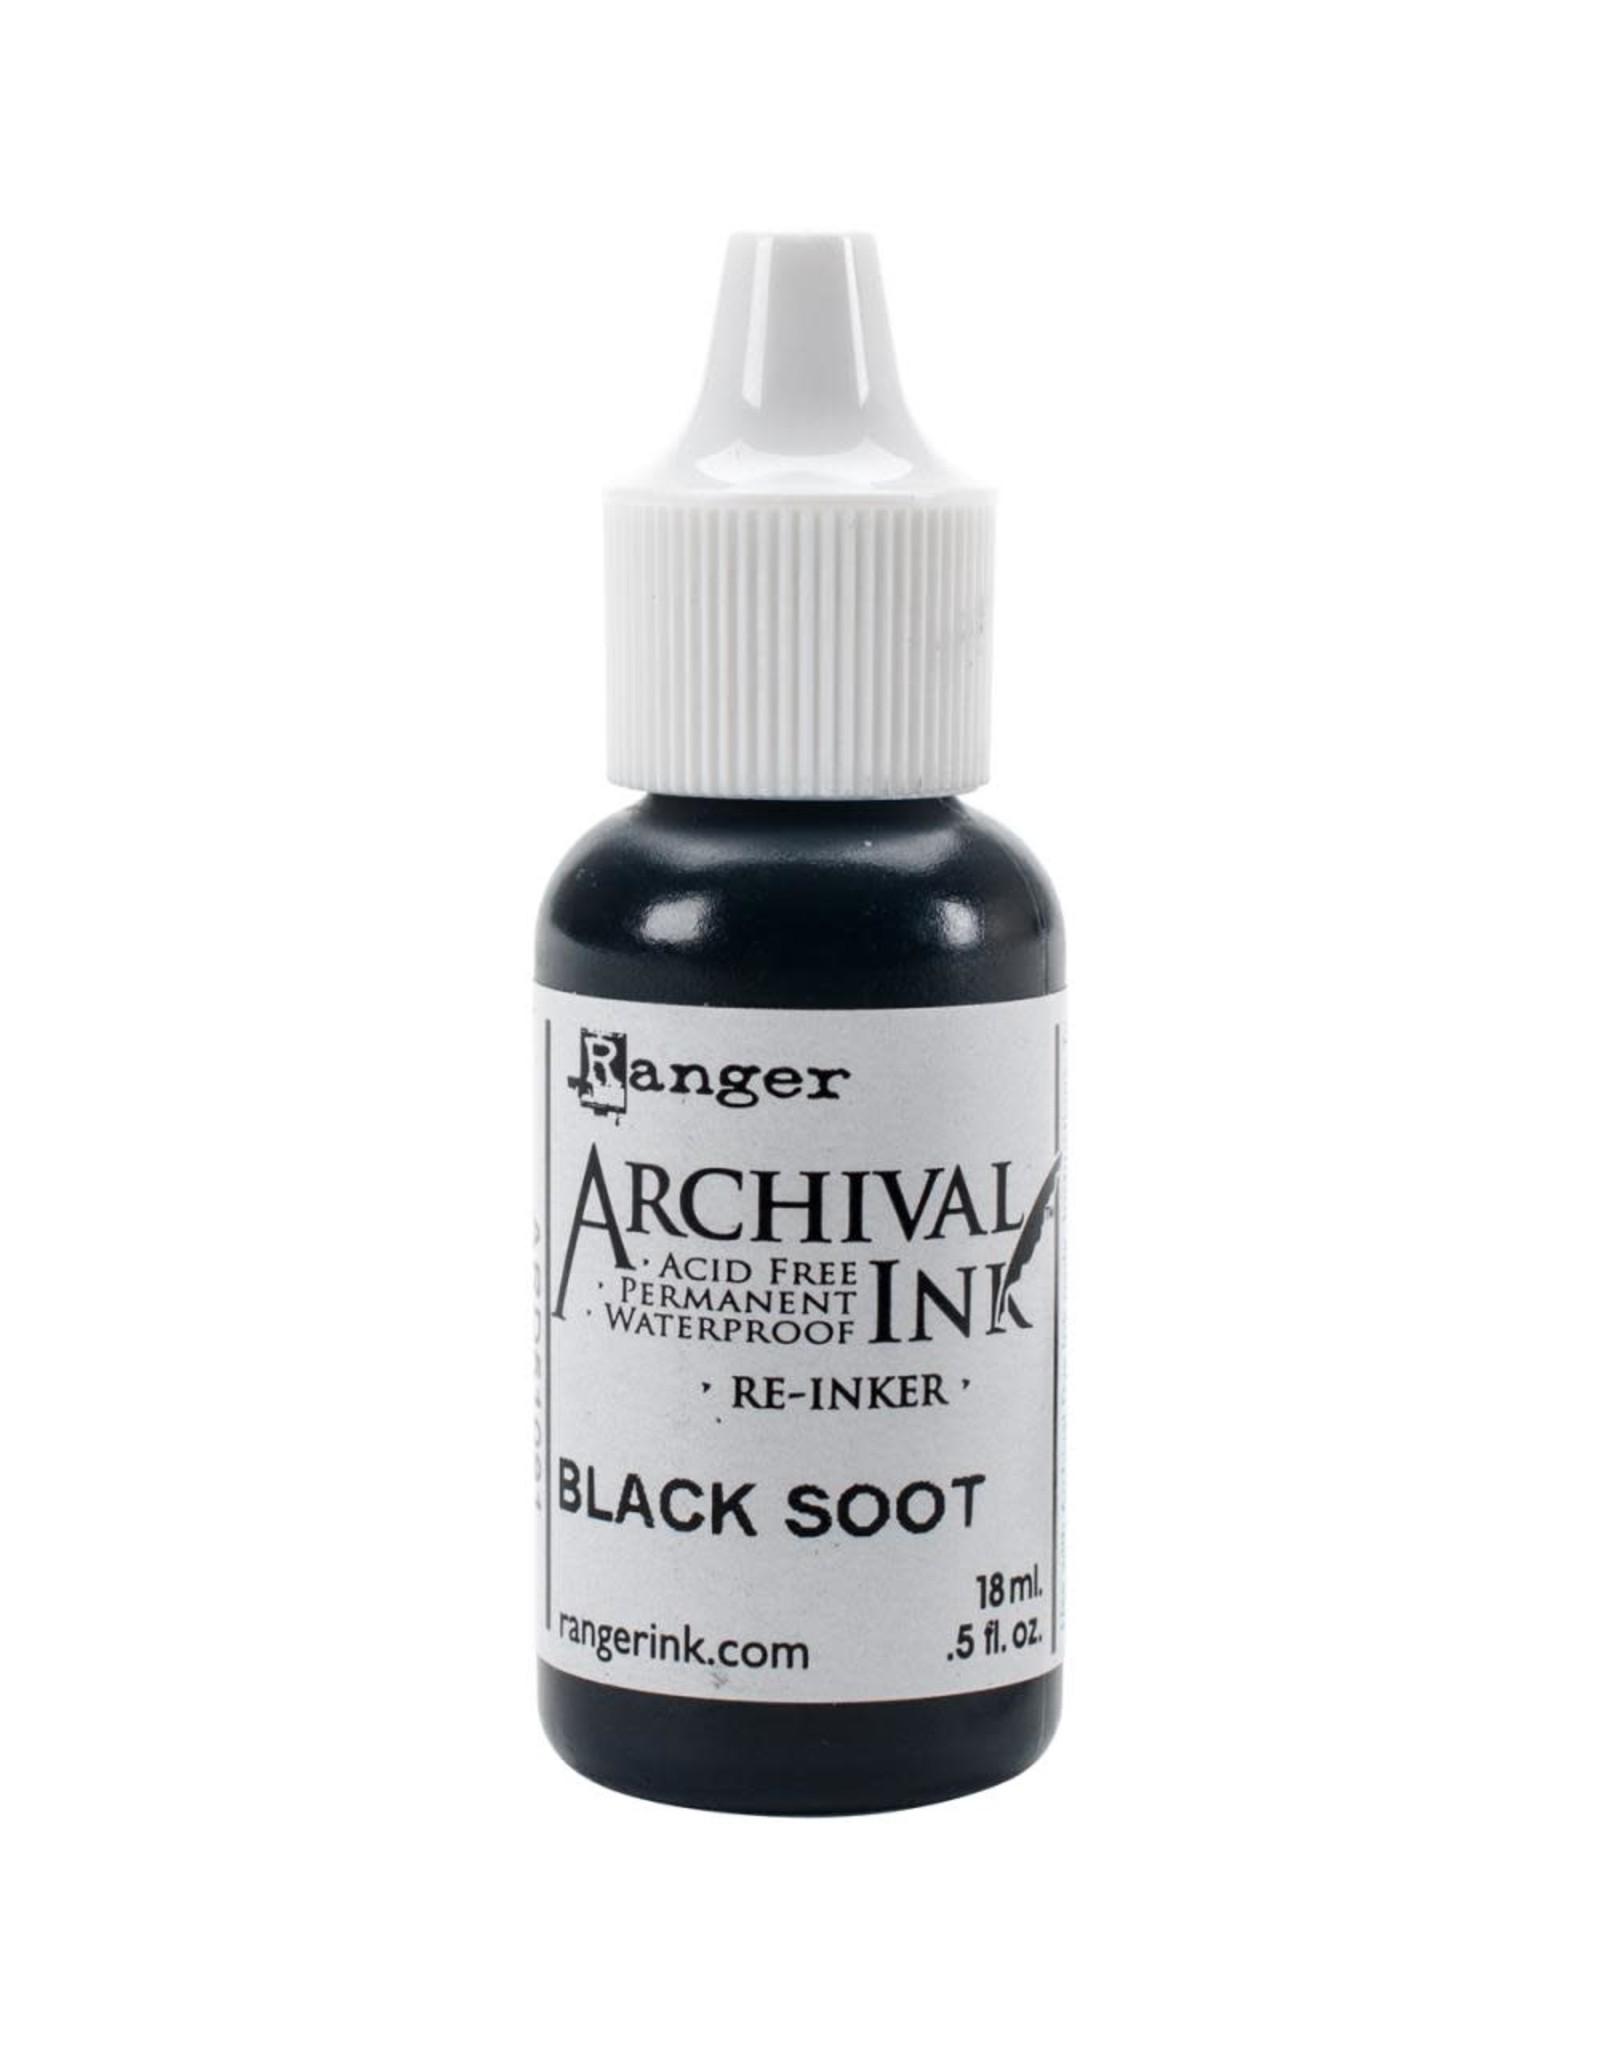 Ranger Black Soot Distress Archival Re-Inker